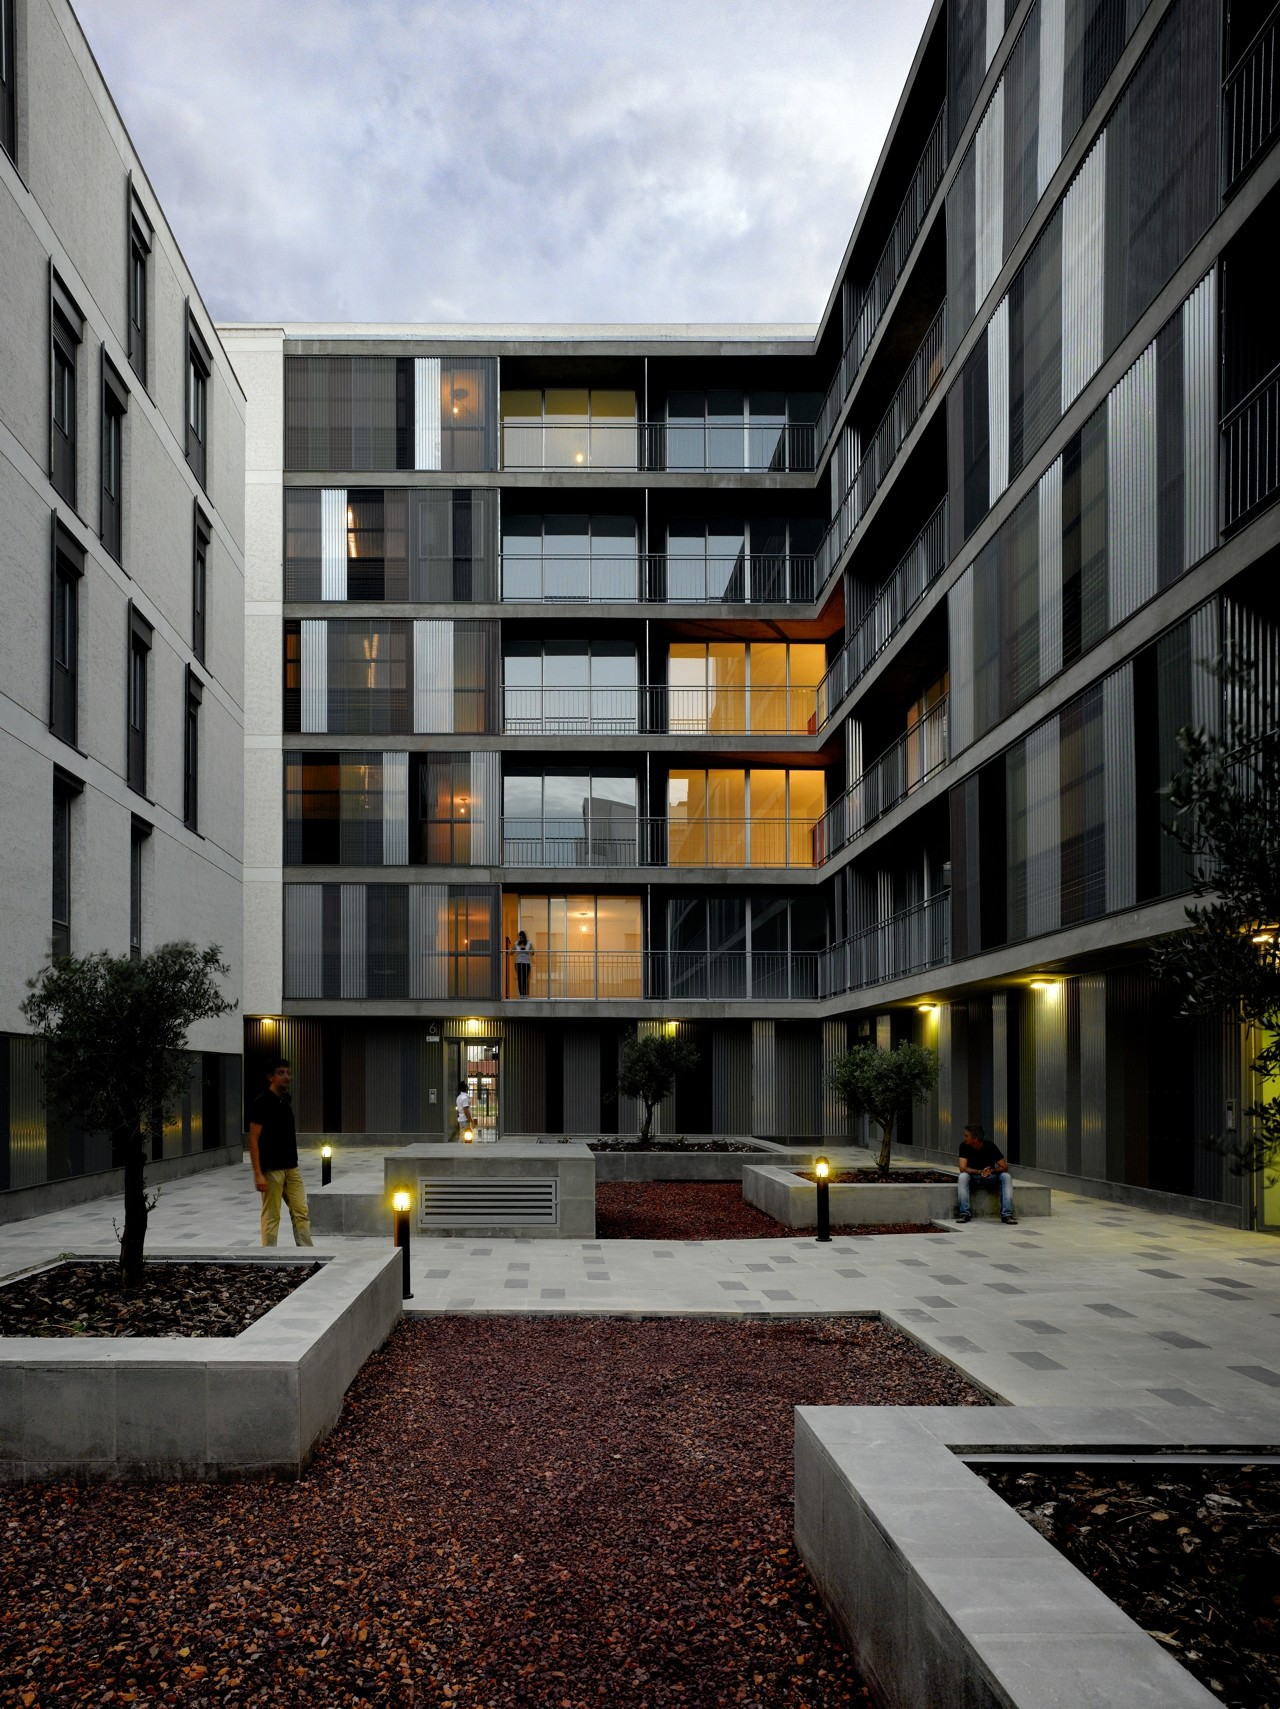 46 viviendas sociales gabriel verd plataforma arquitectura for Plataforma de arquitectura